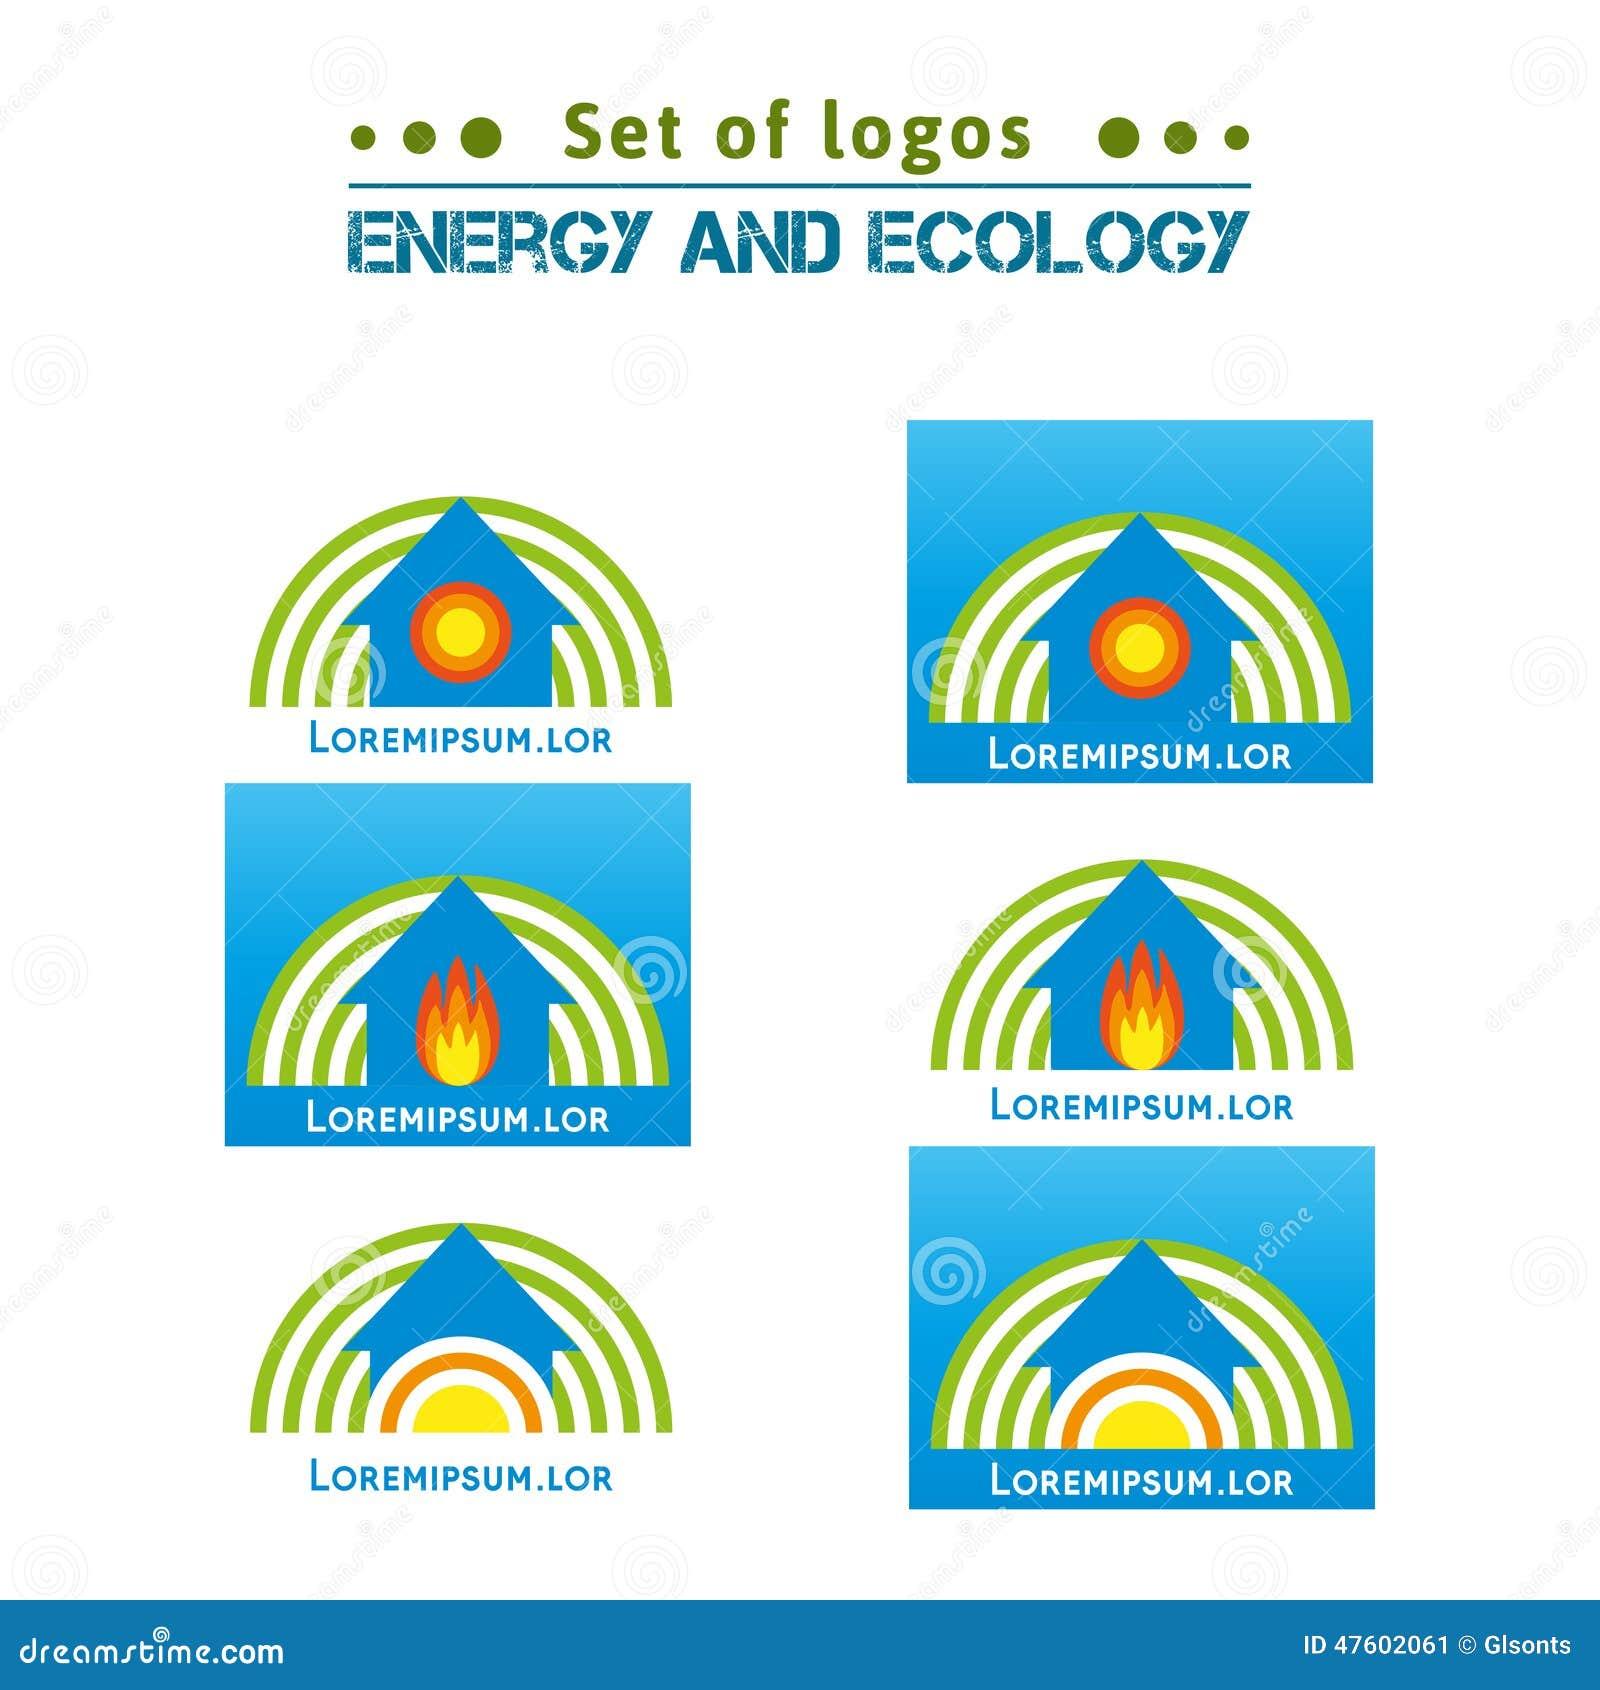 ... Clean Energy. Renewable energy. Alternative energy sources. EPS,JPG